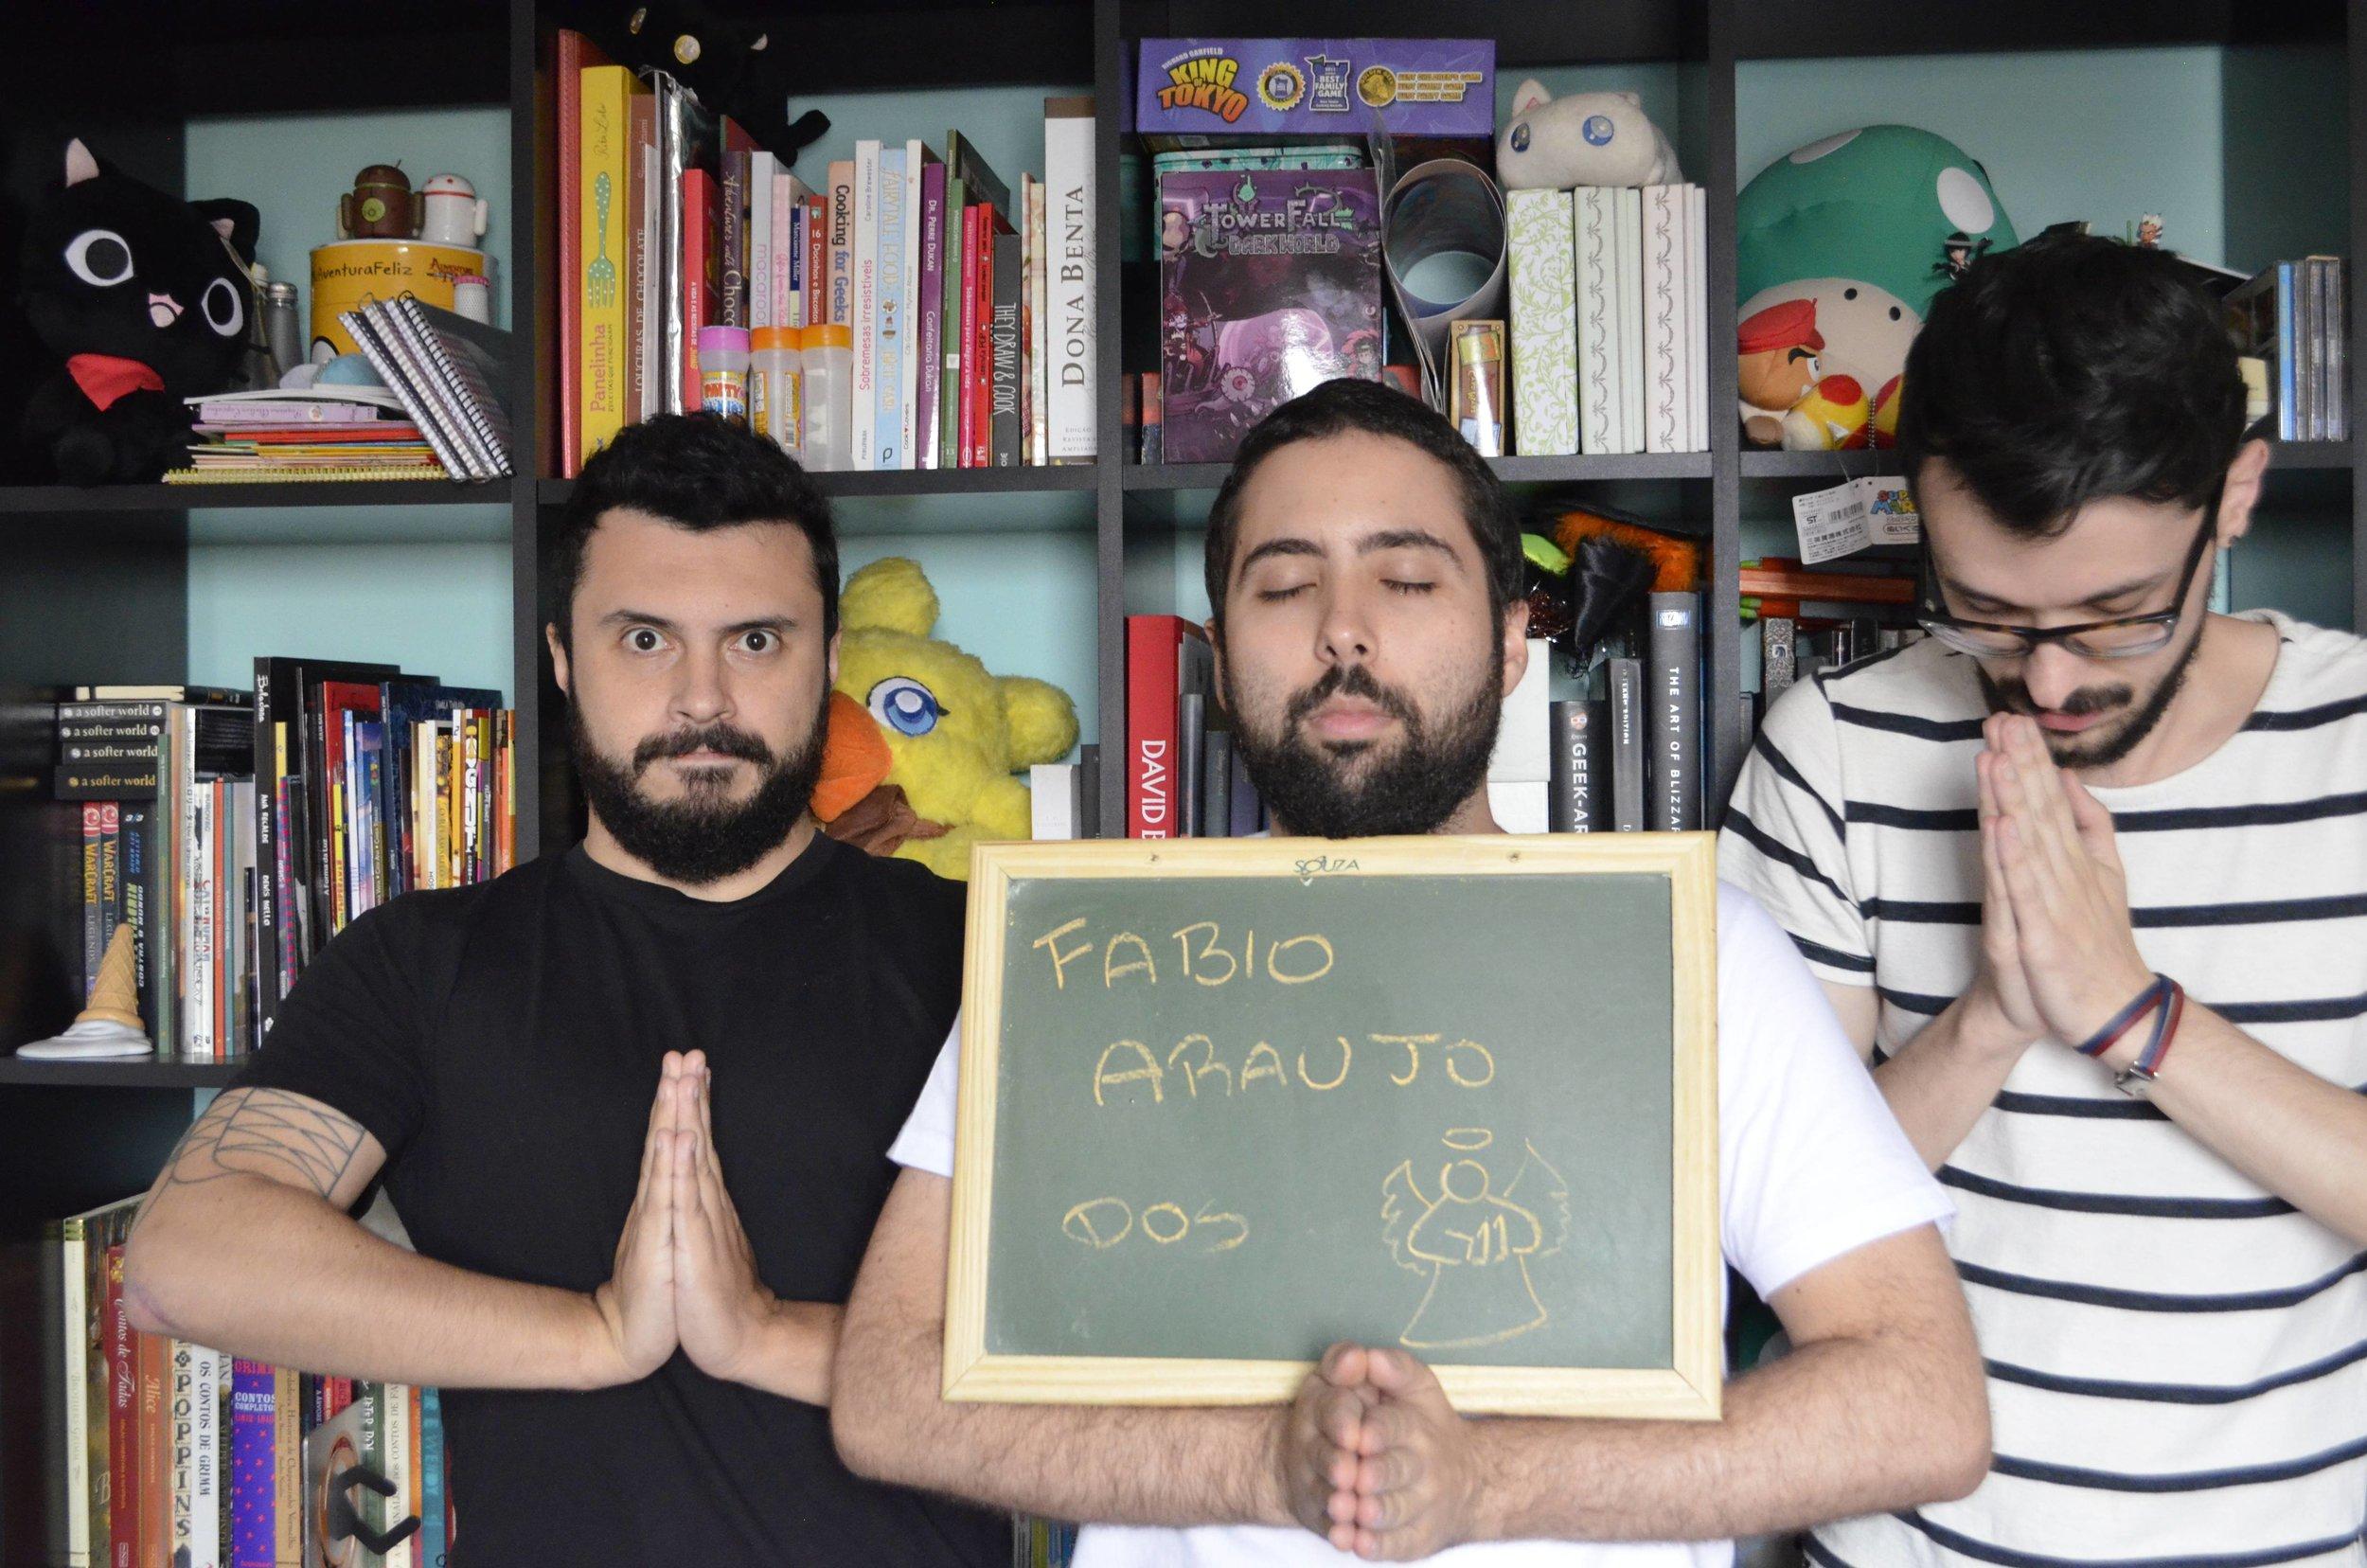 Fabio-Araujo-dos-Santos.jpg